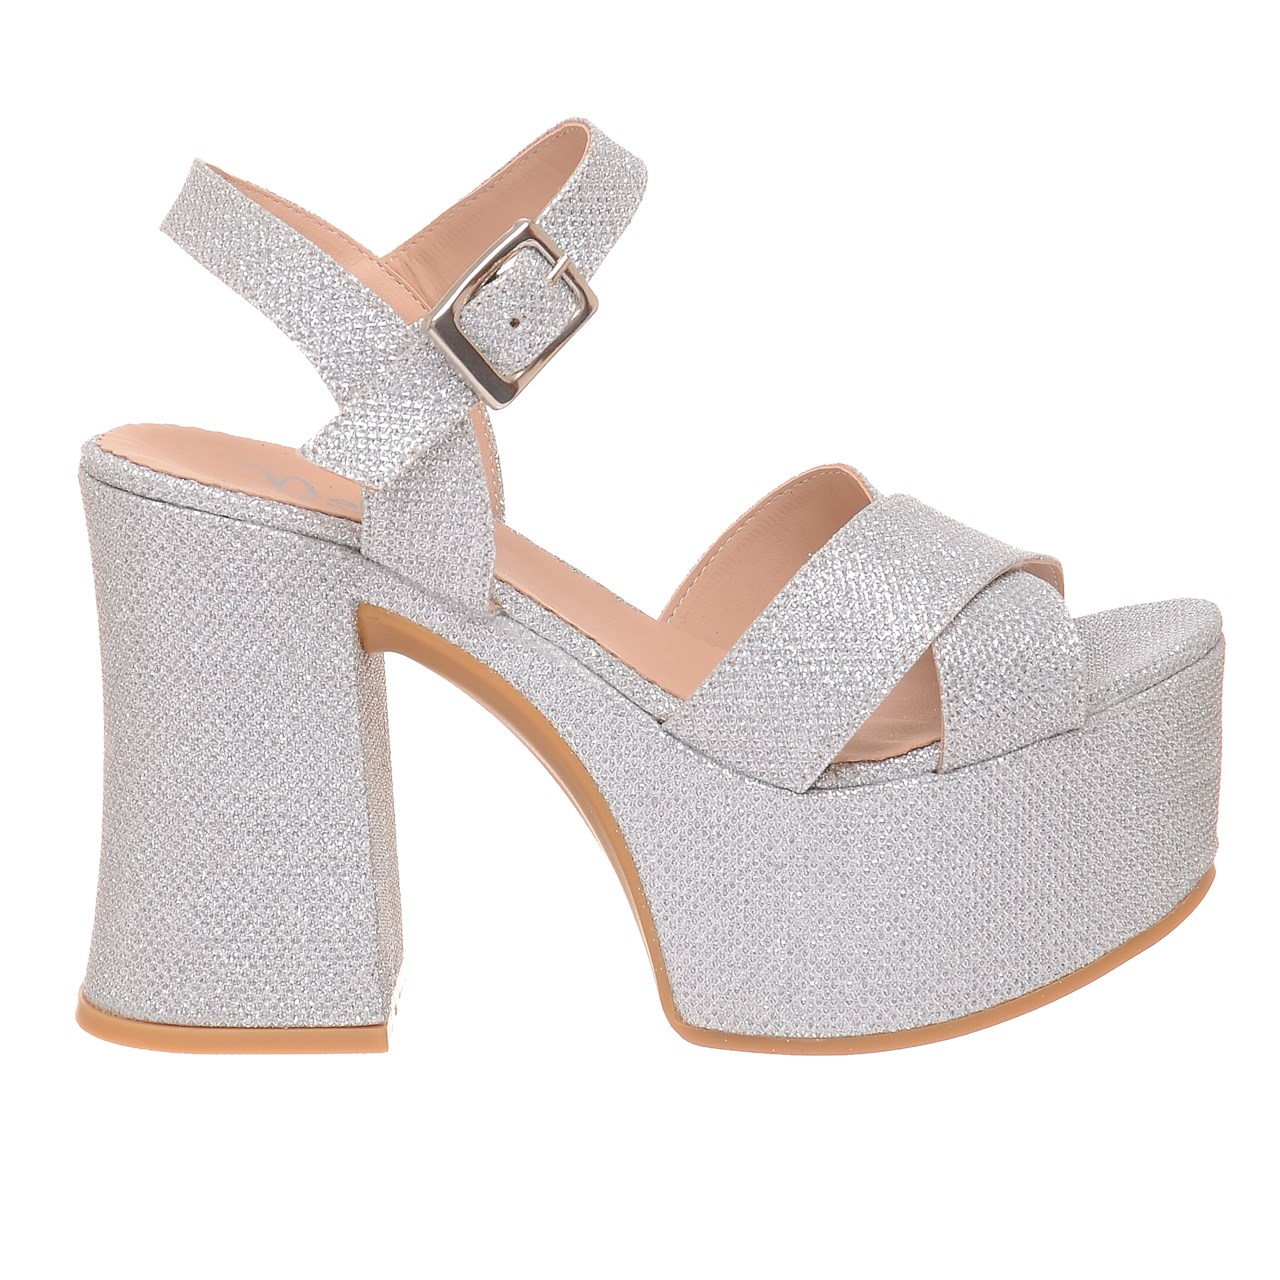 11339312cdb Sandalias De Mujer Fiesta Zapatos Moda Vestir Taco Hermosas